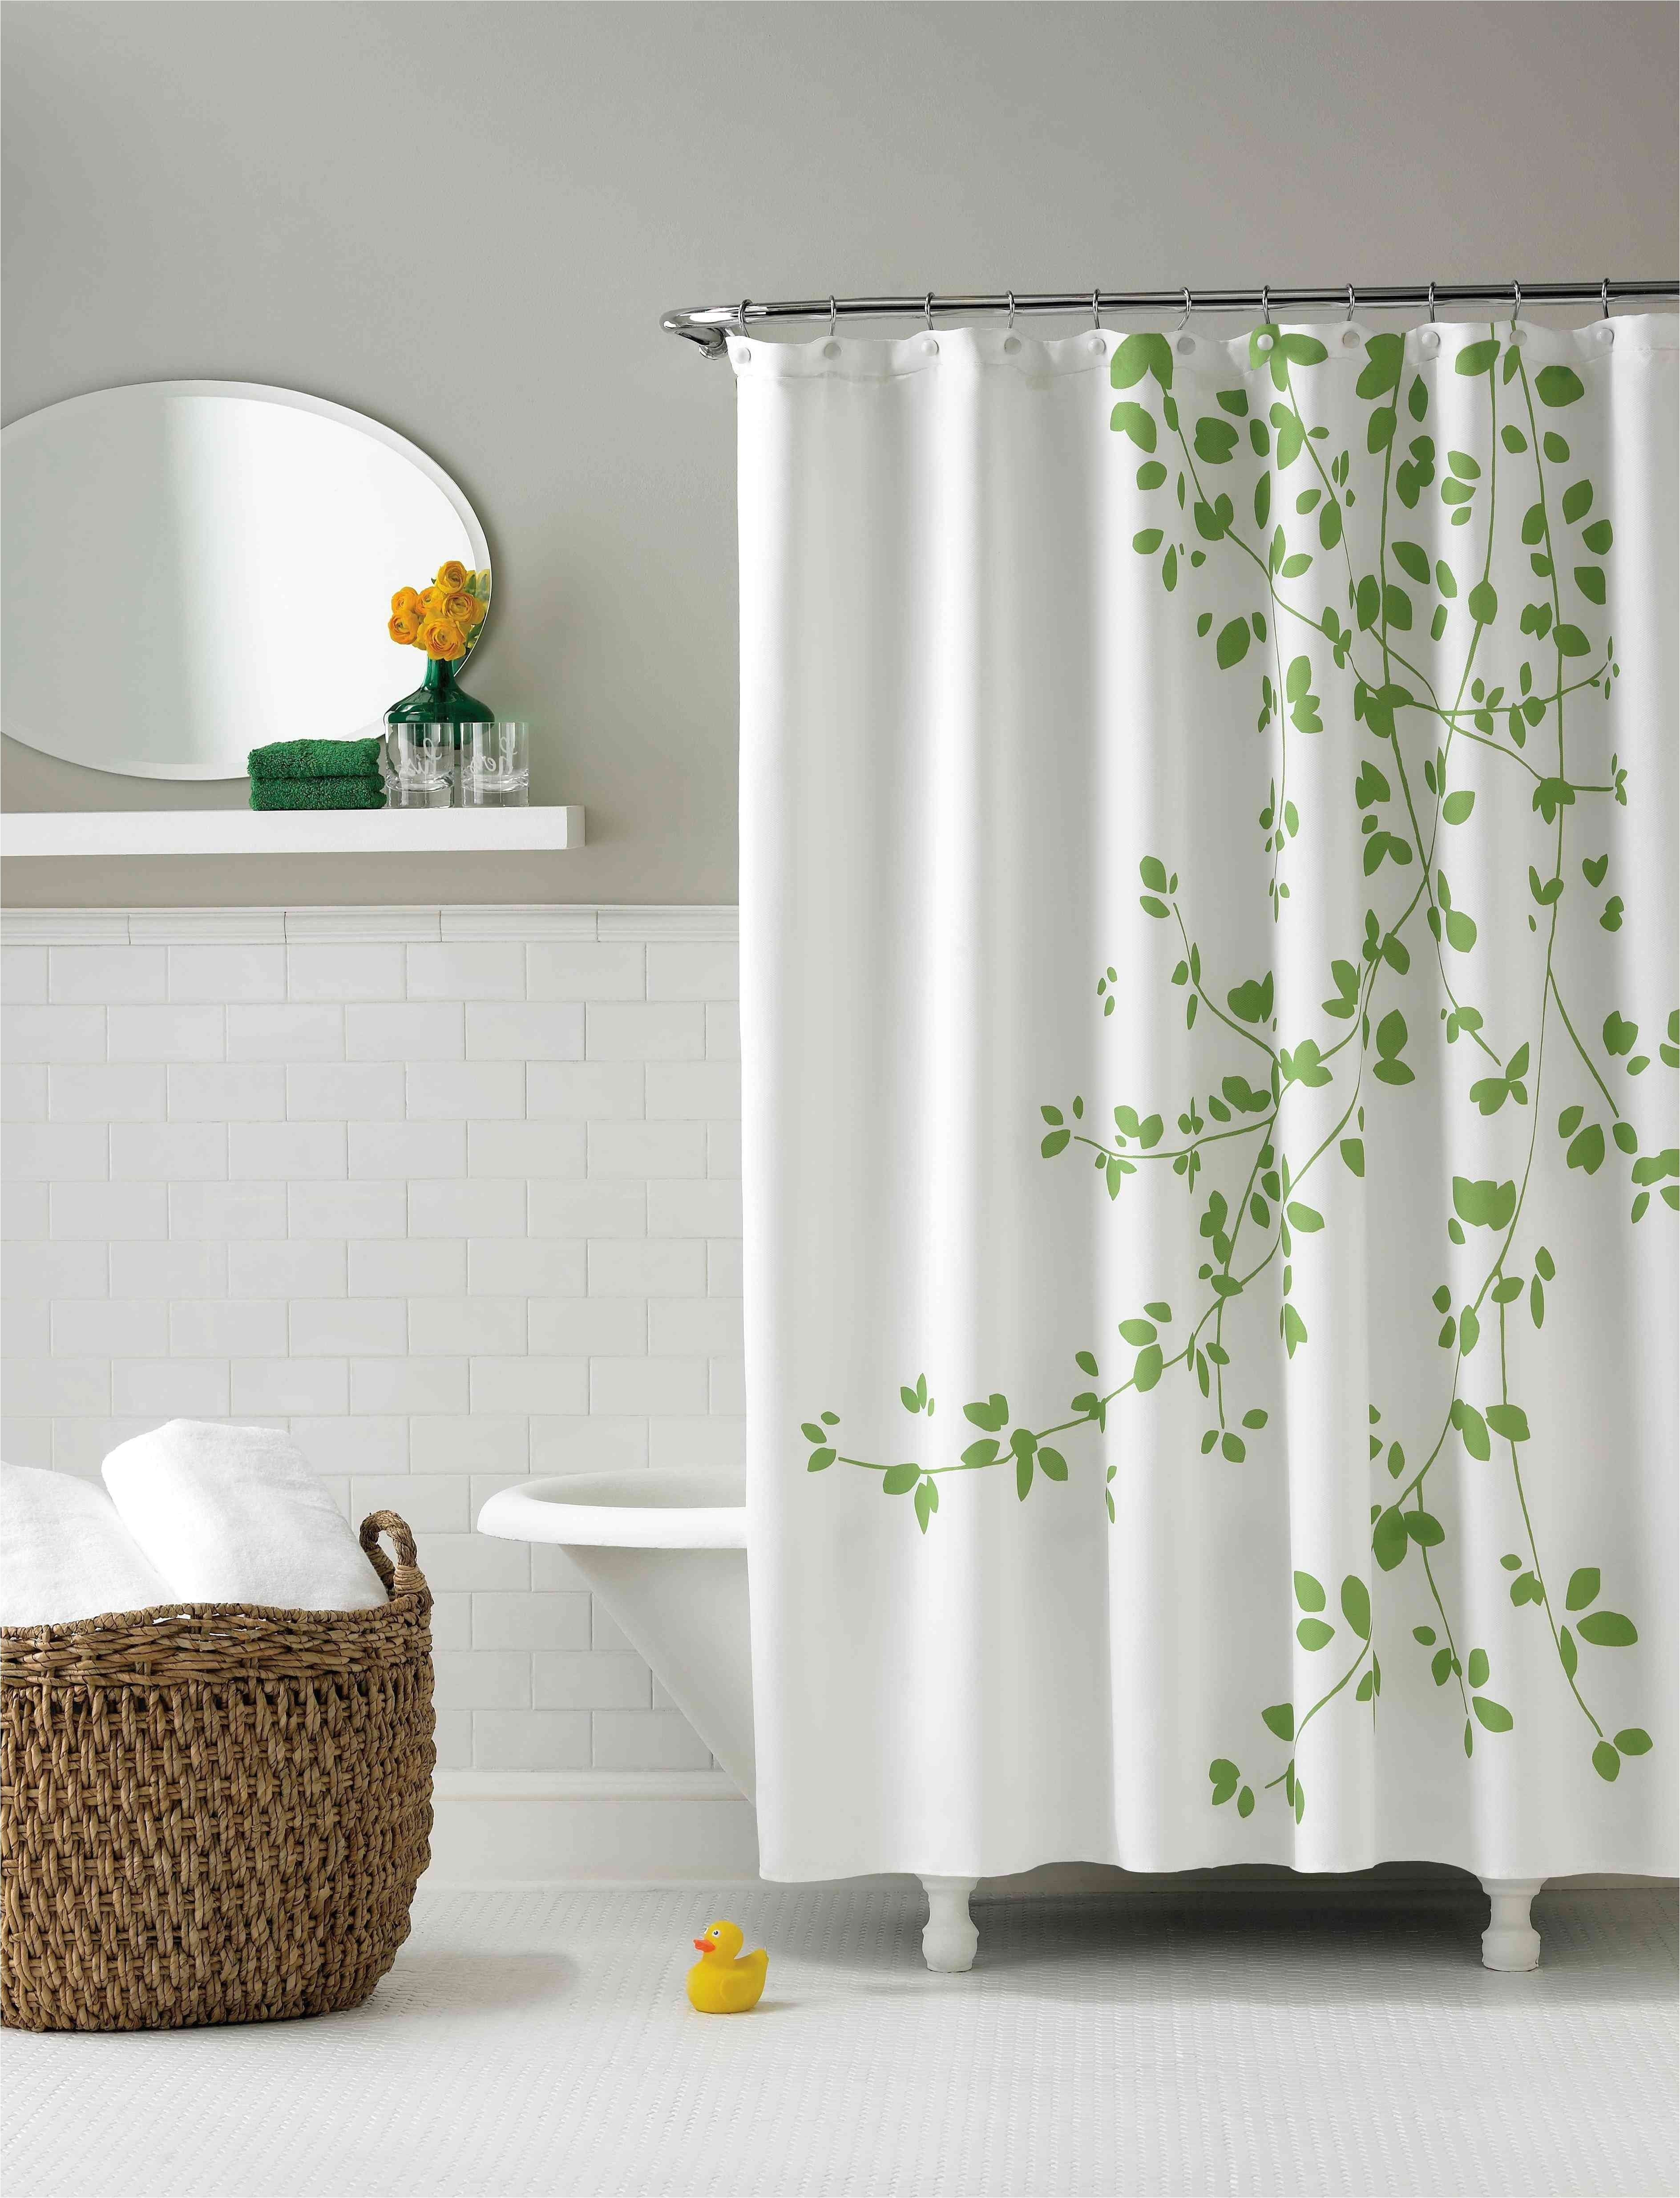 dandelion shower curtain best furniture high end shower curtains elegant dillards curtains 0d